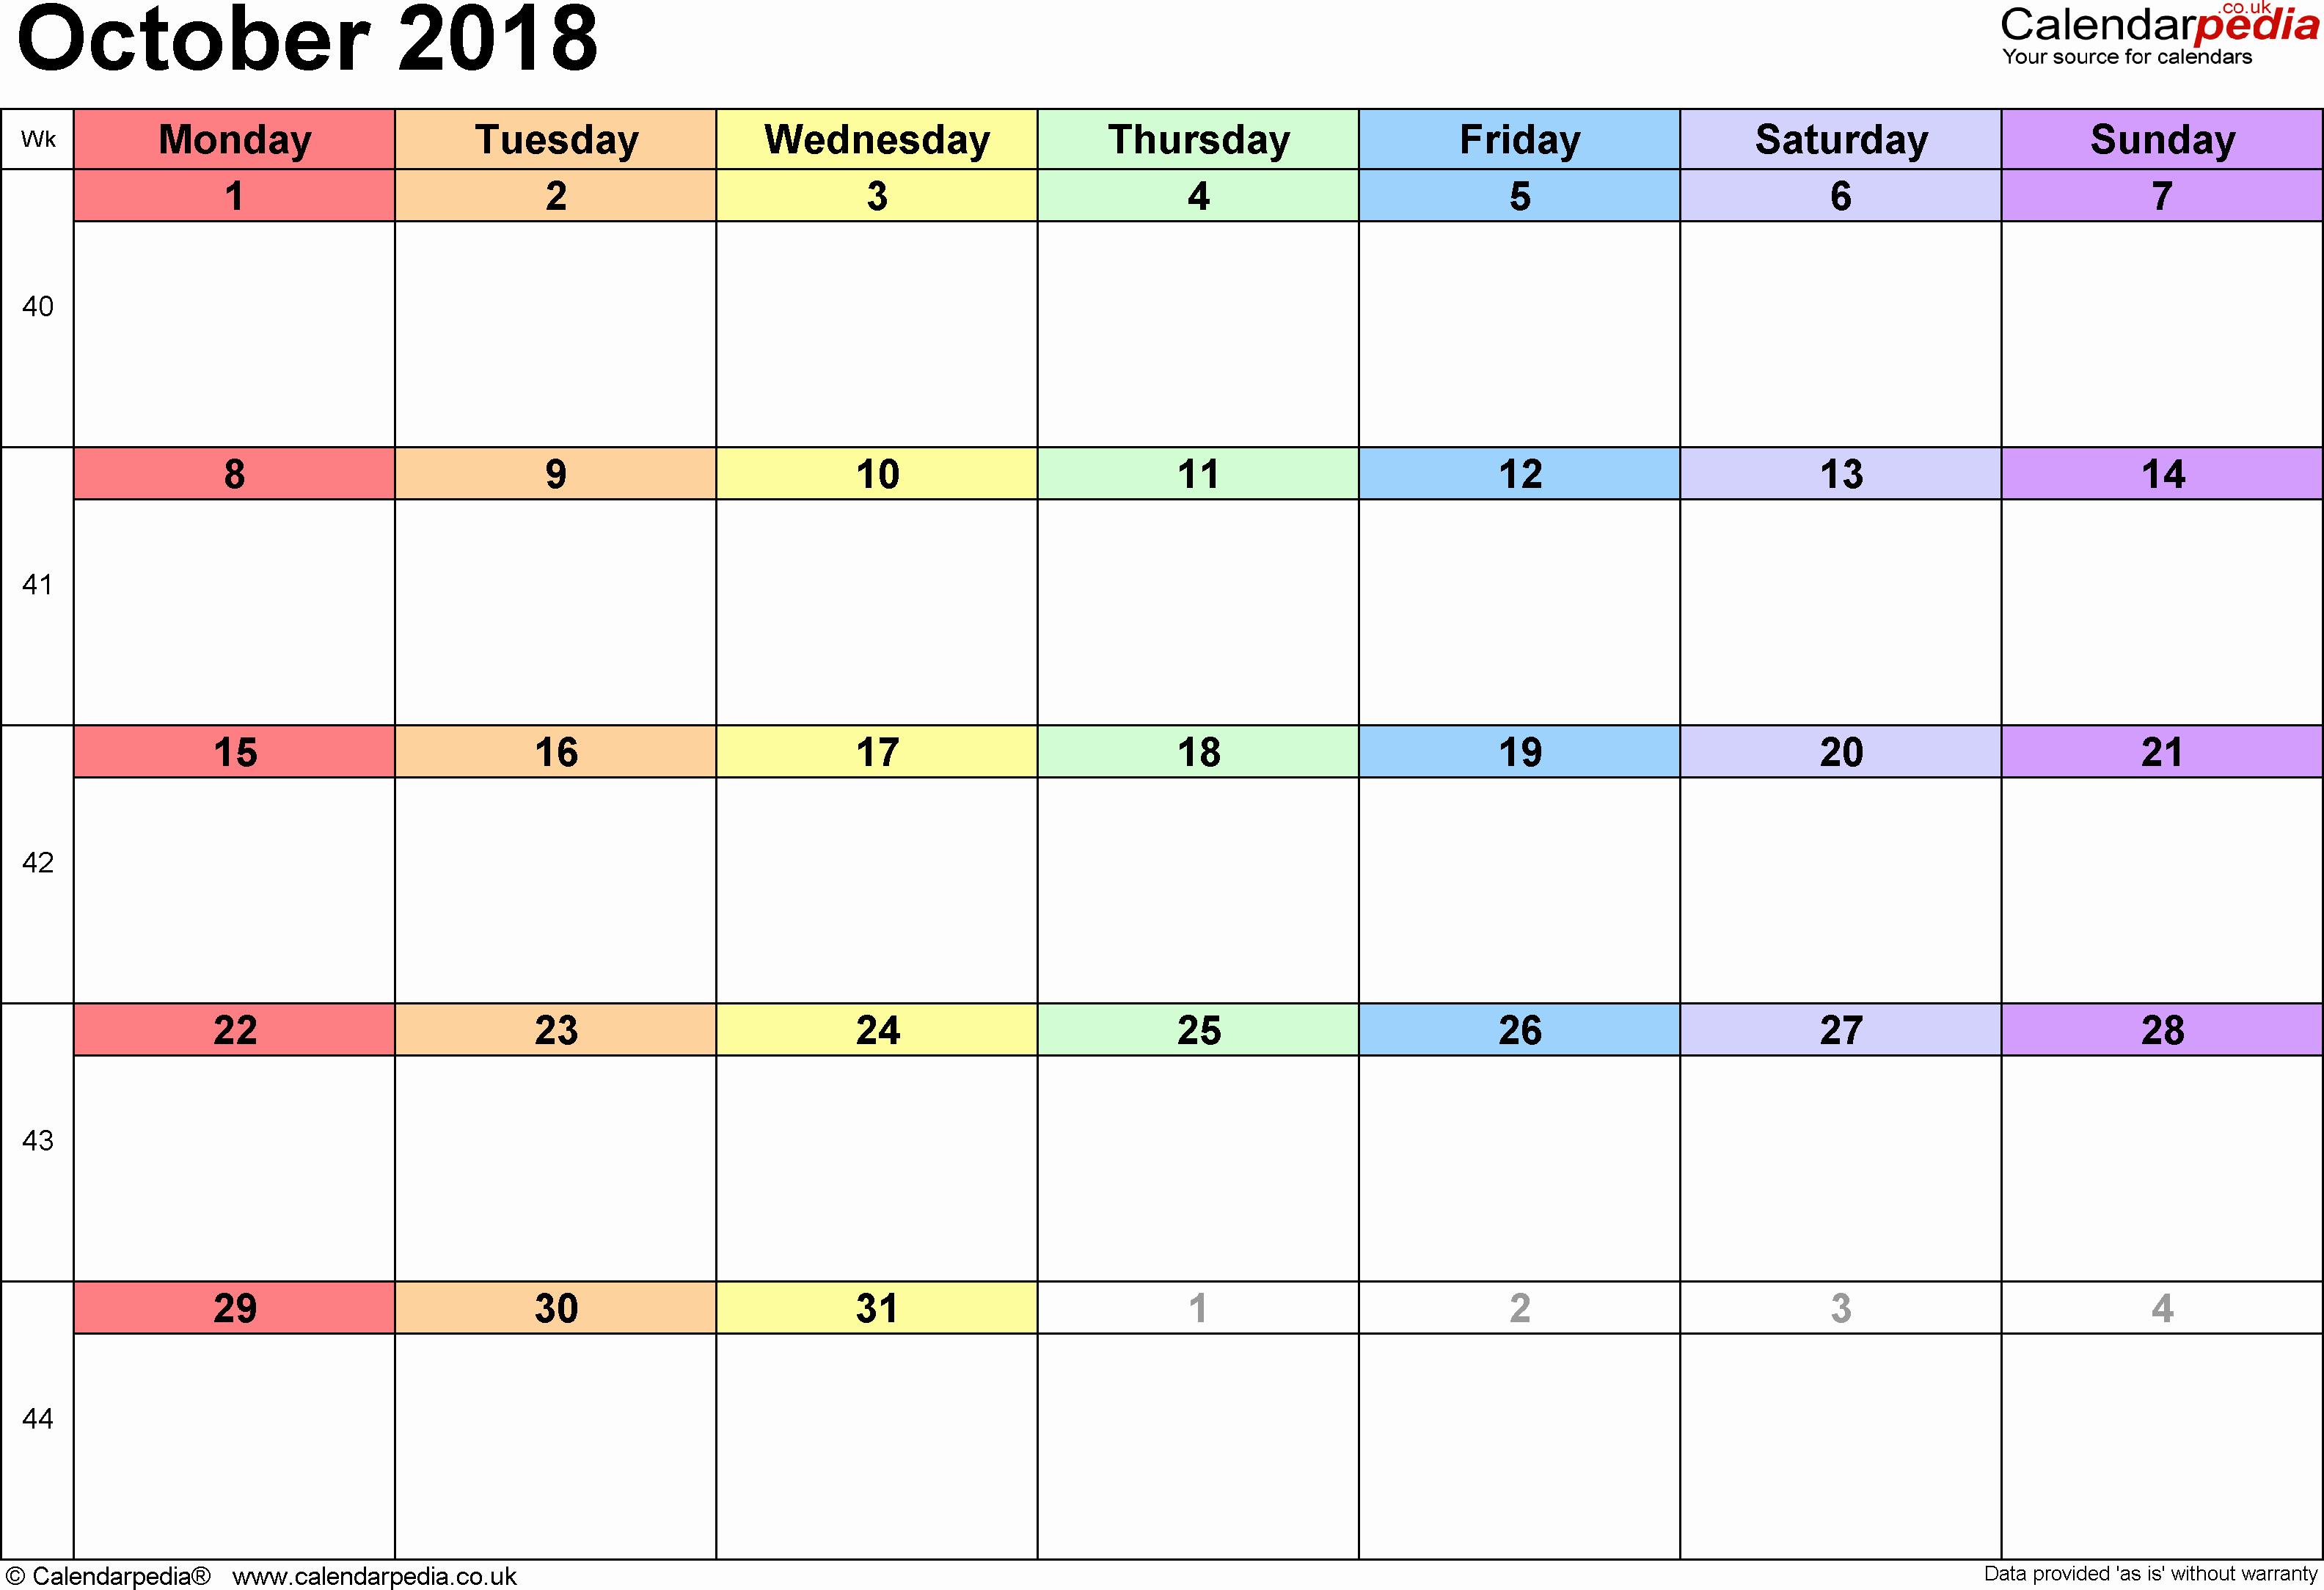 October 2018 Printable Calendar Word Best Of October 2018 Calendar Word